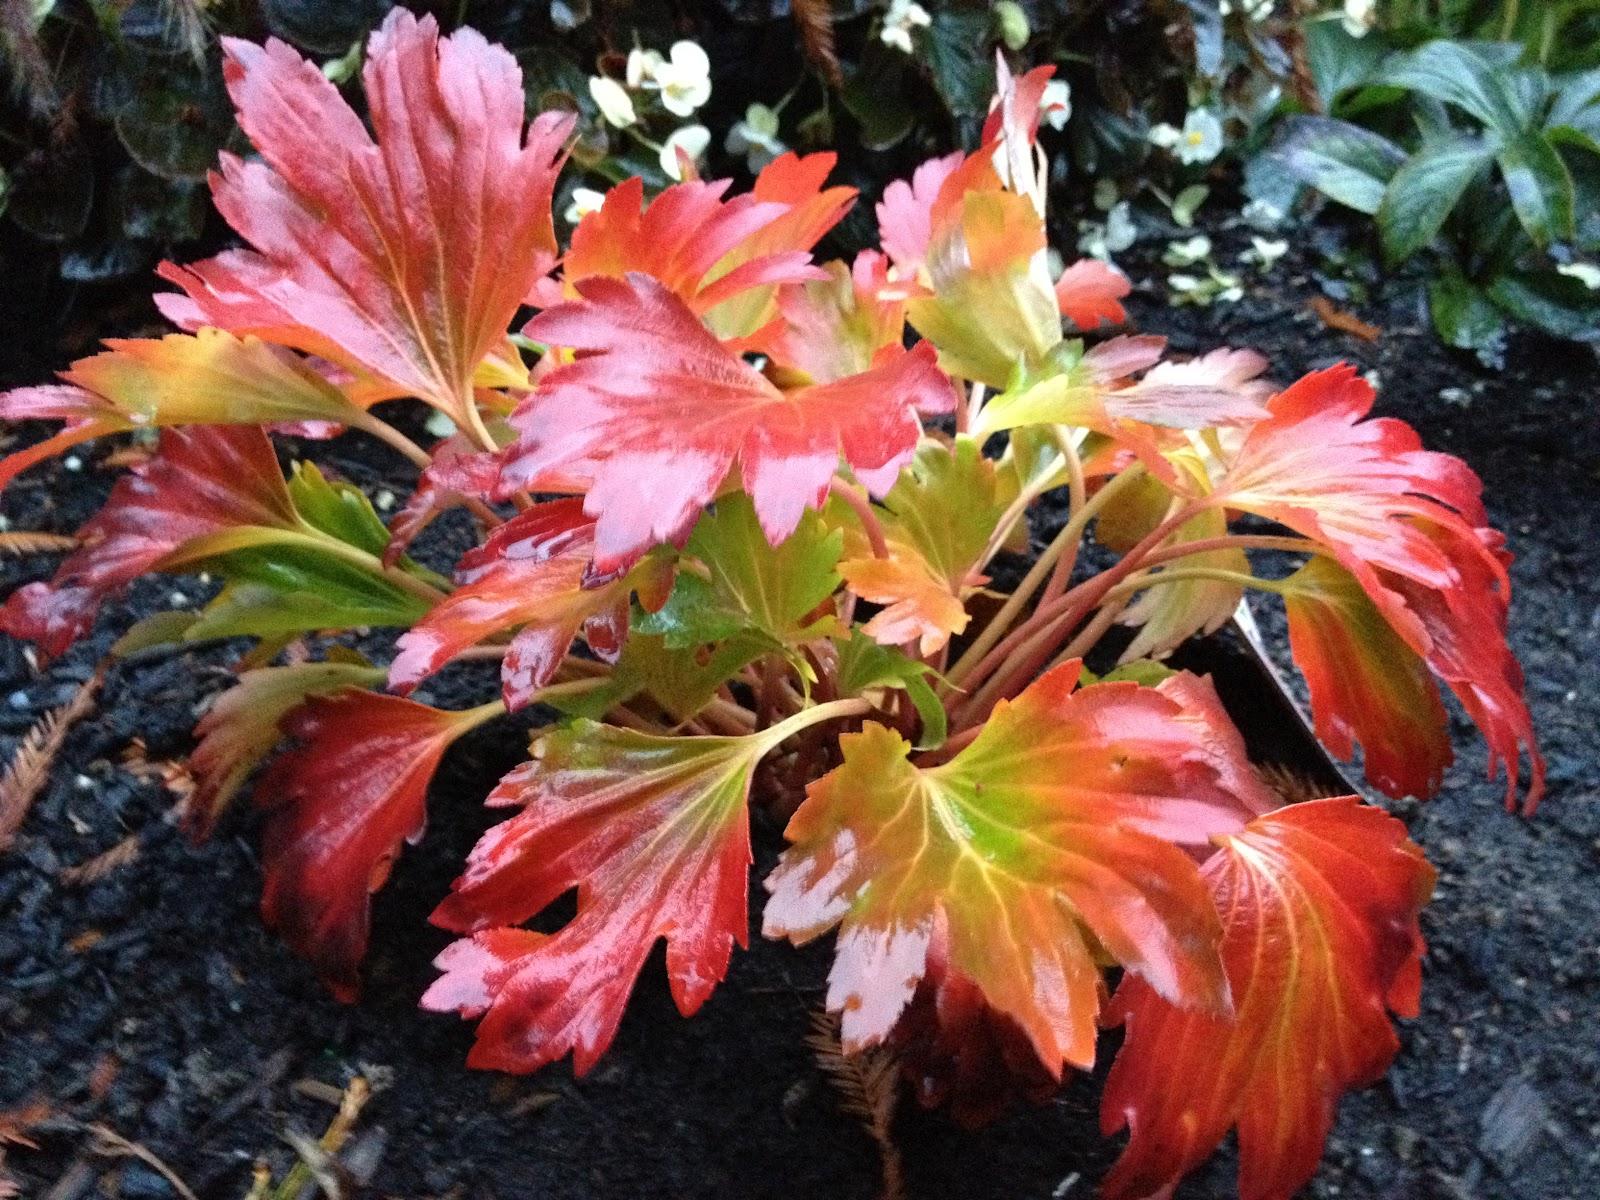 Plants of the galicic garden mukdenia rossii crimson fans